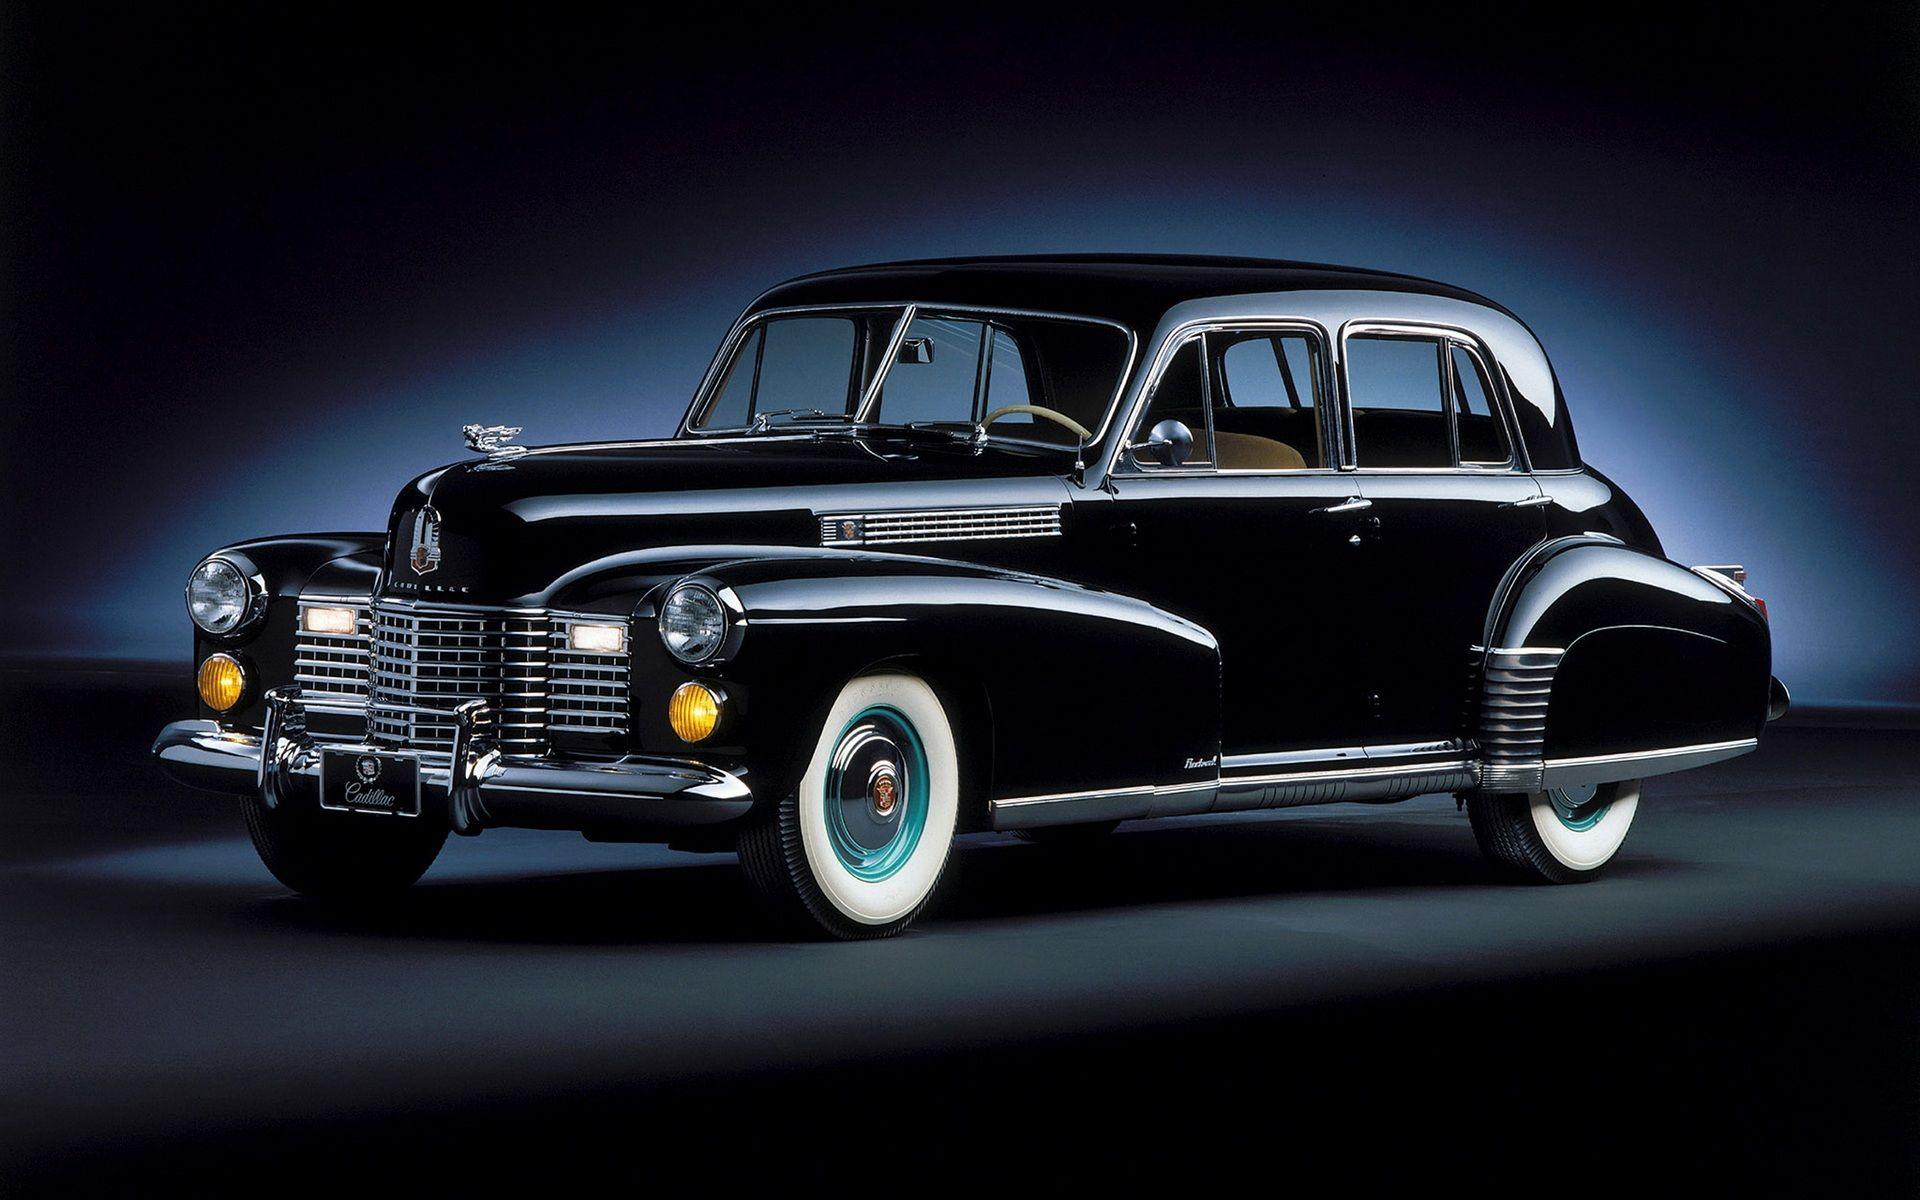 Cadillac Sixty Special 1941 | Cars | Pinterest | Cadillac, Vintage ...